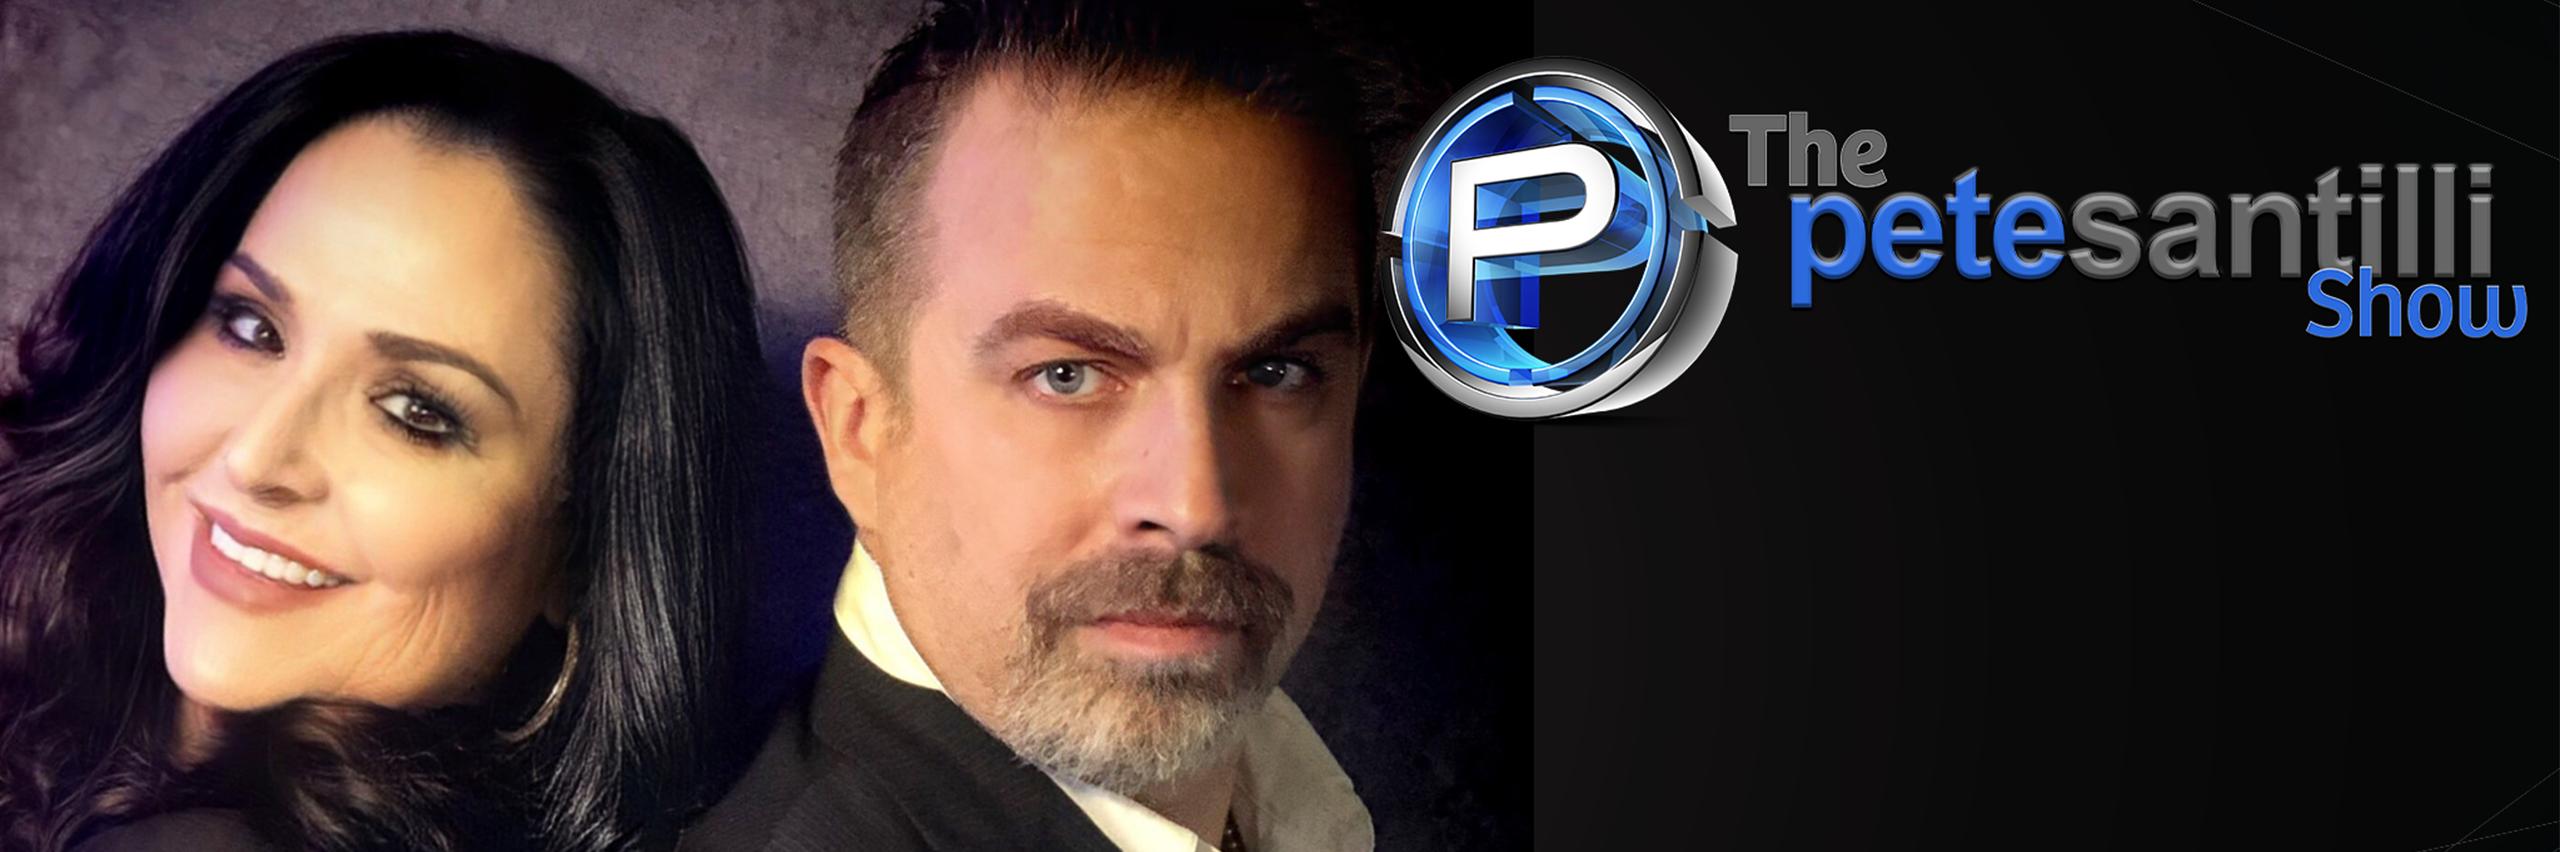 The_Pete_Santilli_Show-header02